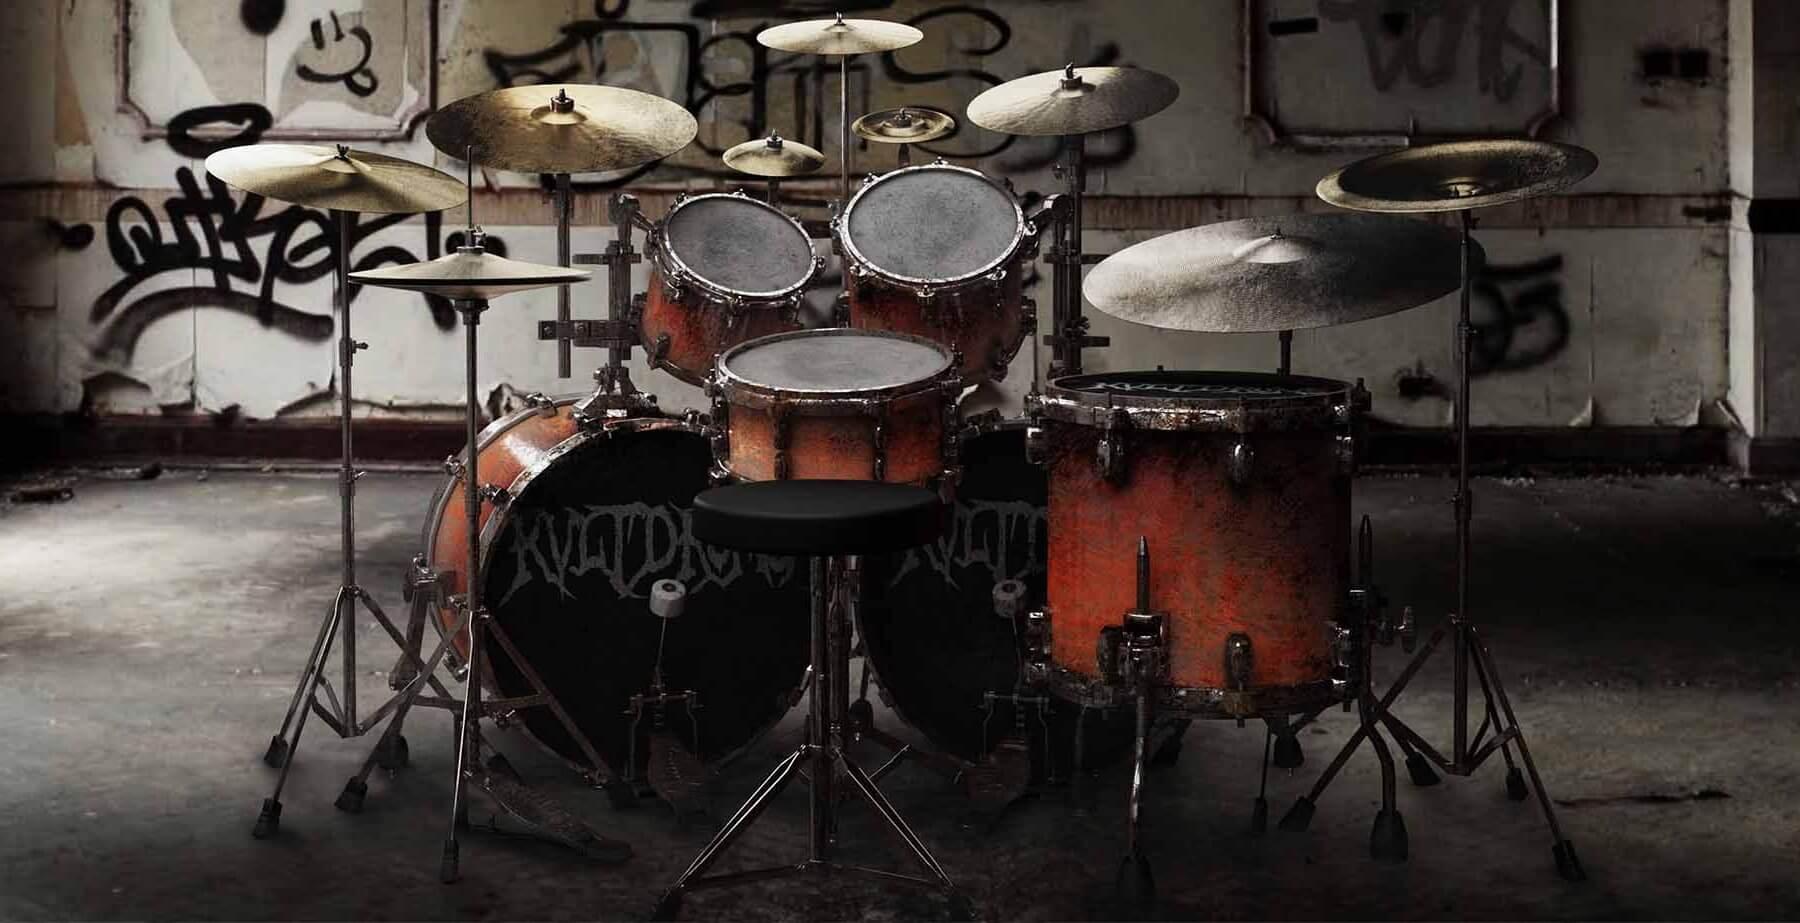 KVLT Drums old school black metal drum instrument plugin